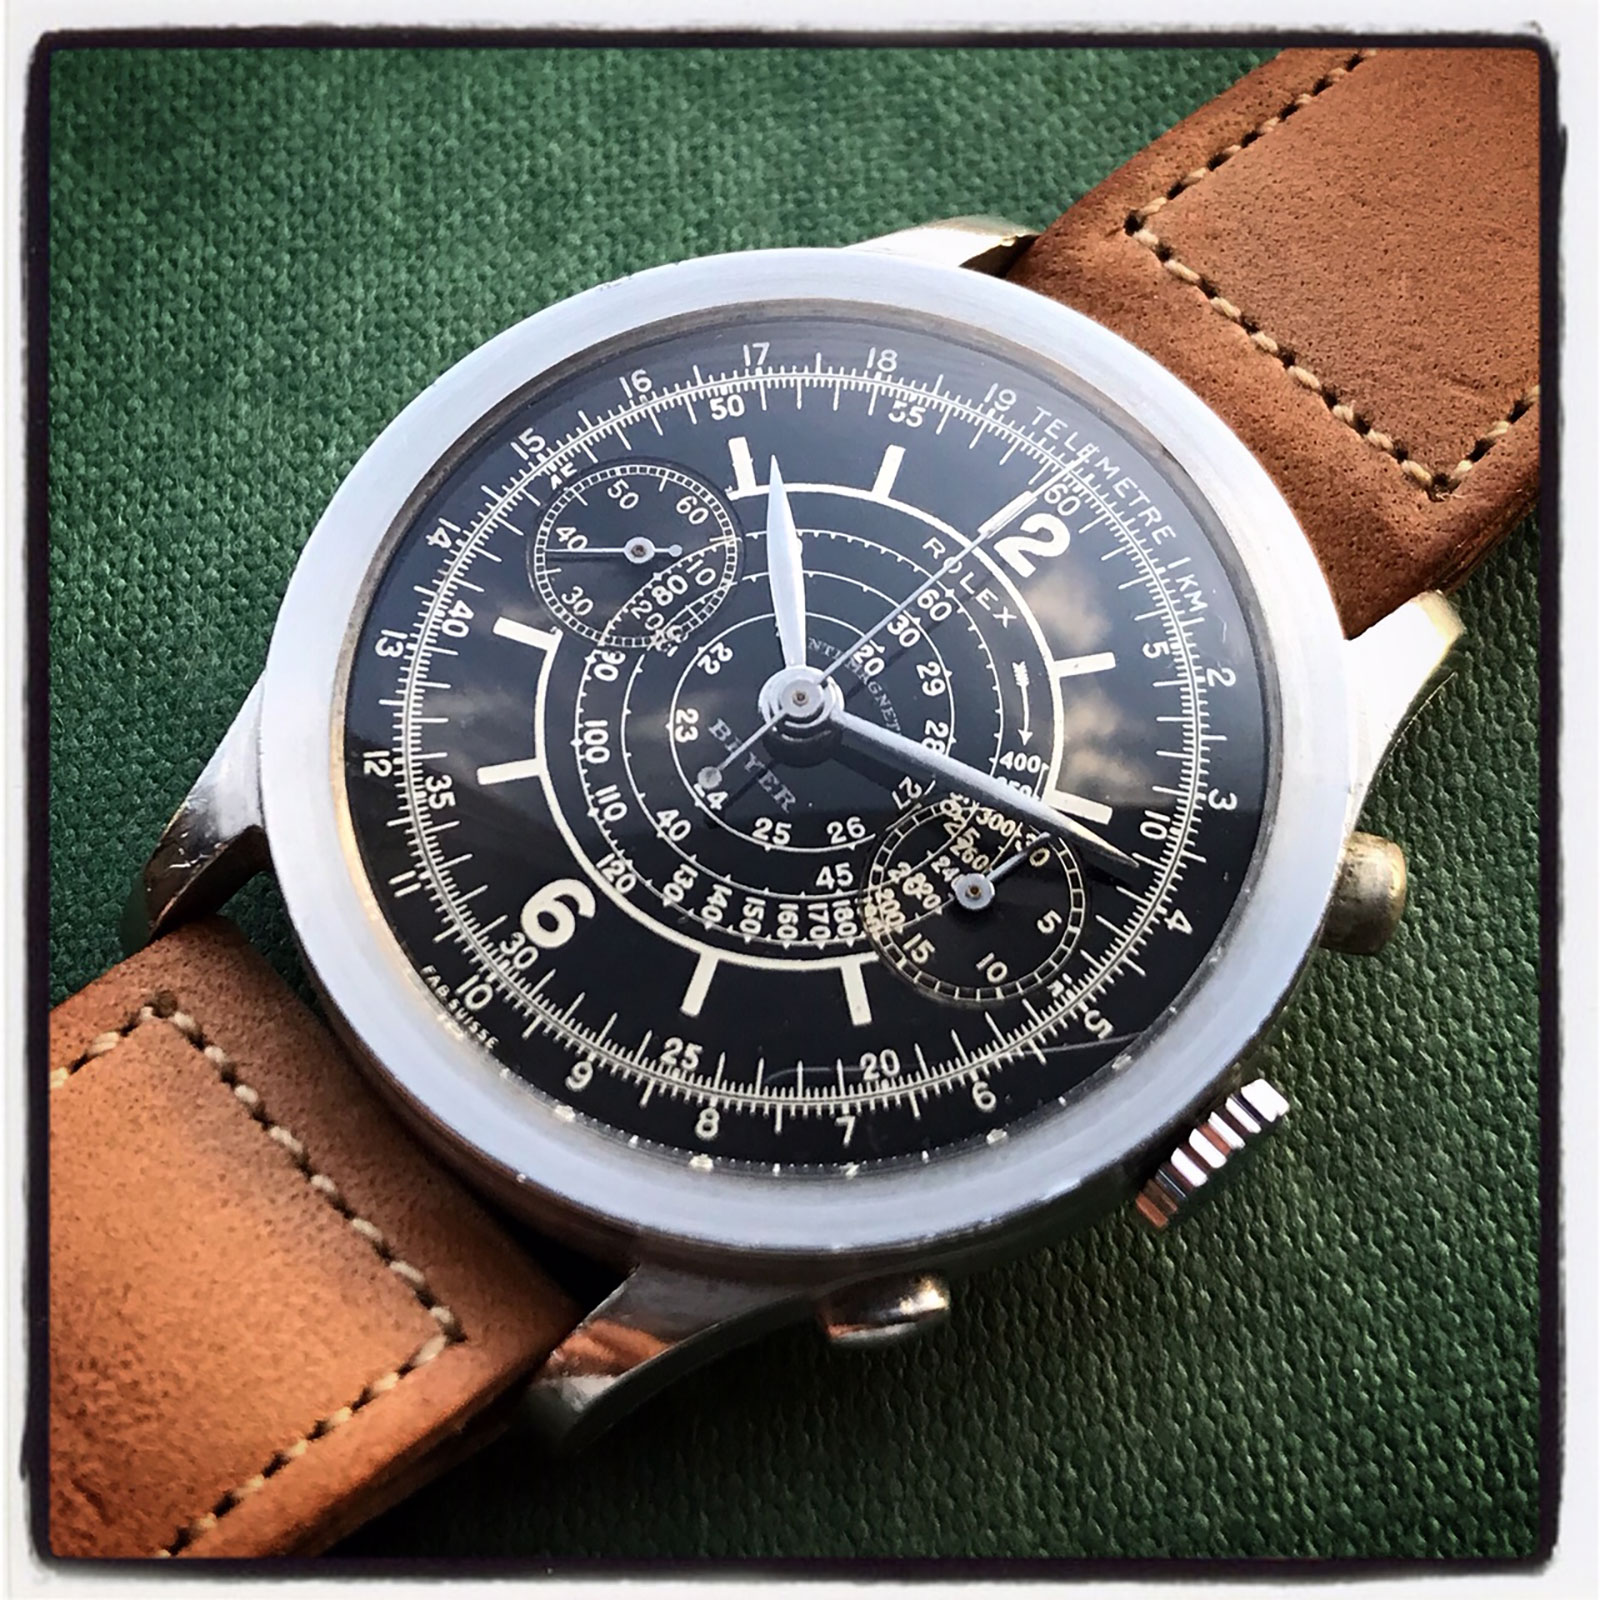 Rolex chronograph 2508 Beyer